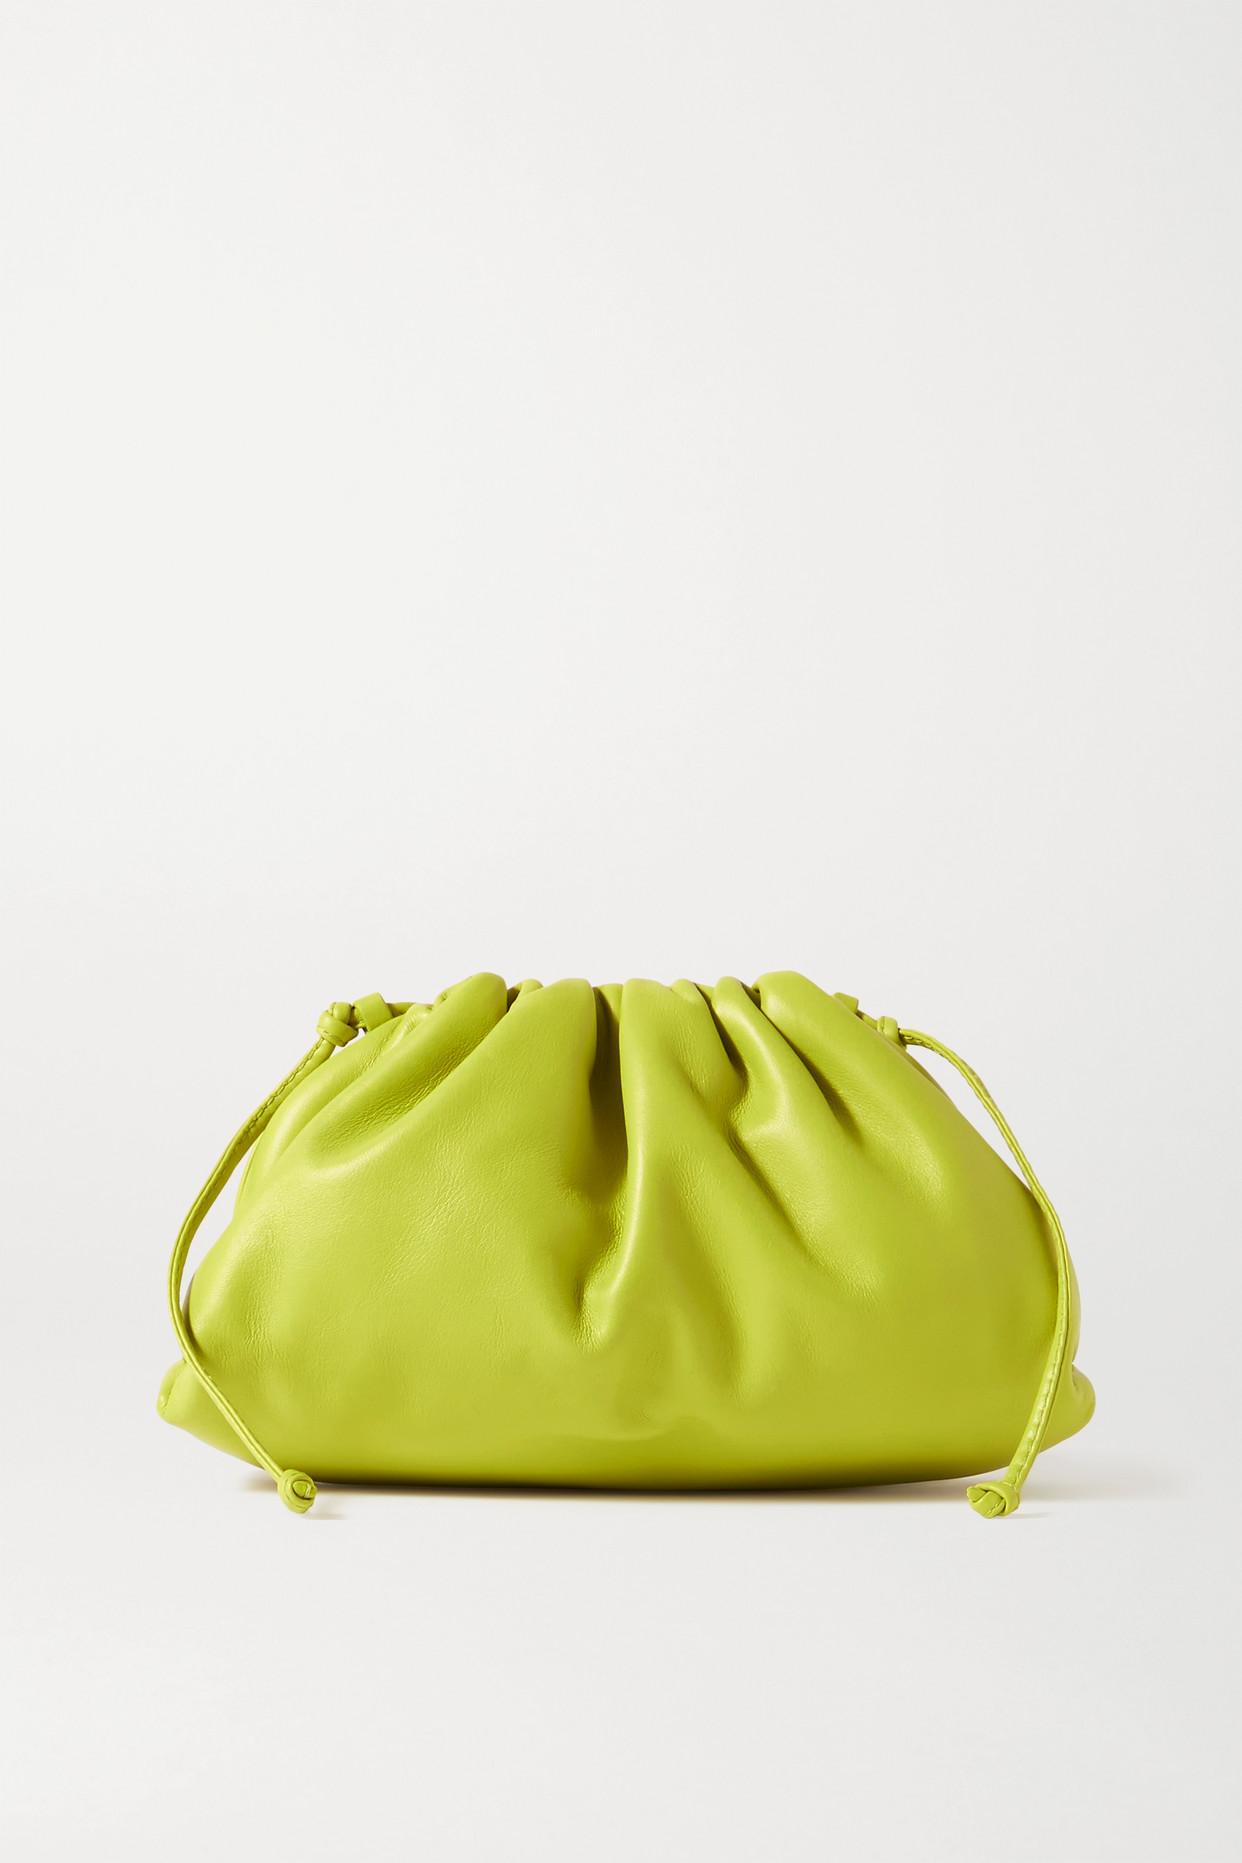 BOTTEGA VENETA - The Pouch 缩褶皮革小号手拿包 - 绿色 - one size